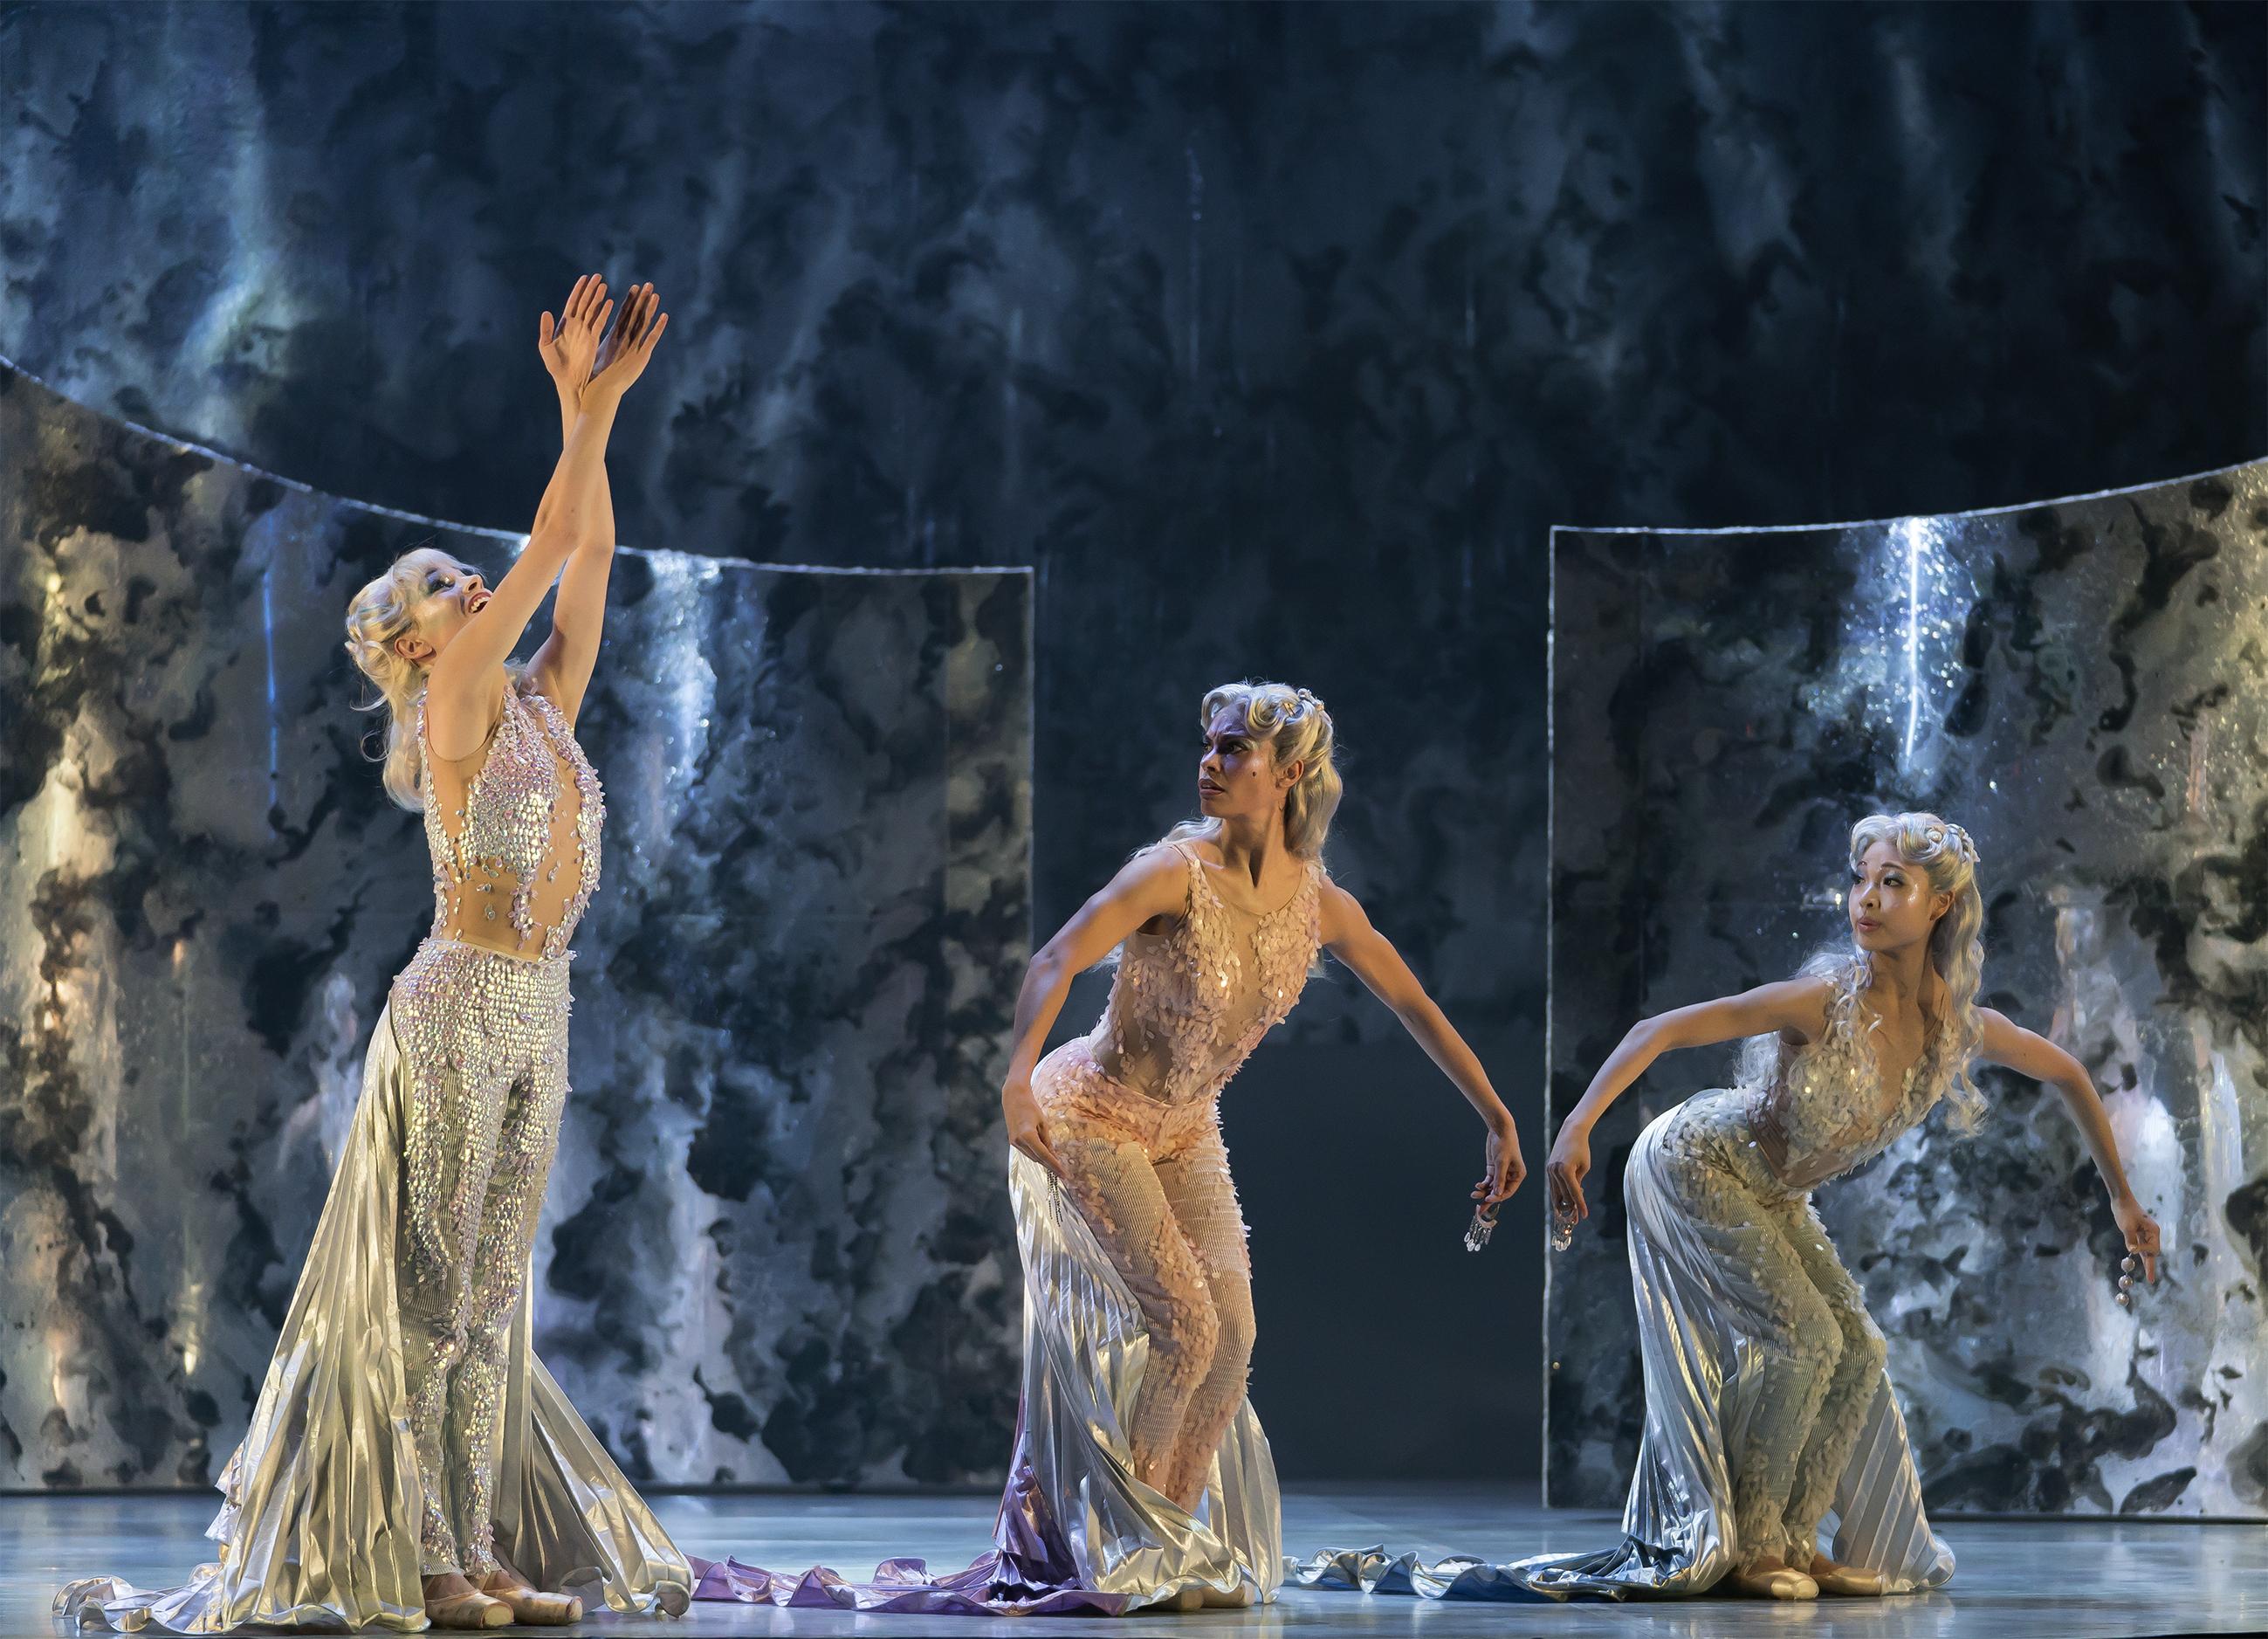 Northern Ballet dancer Abigail Prudames in The Little Mermaid.